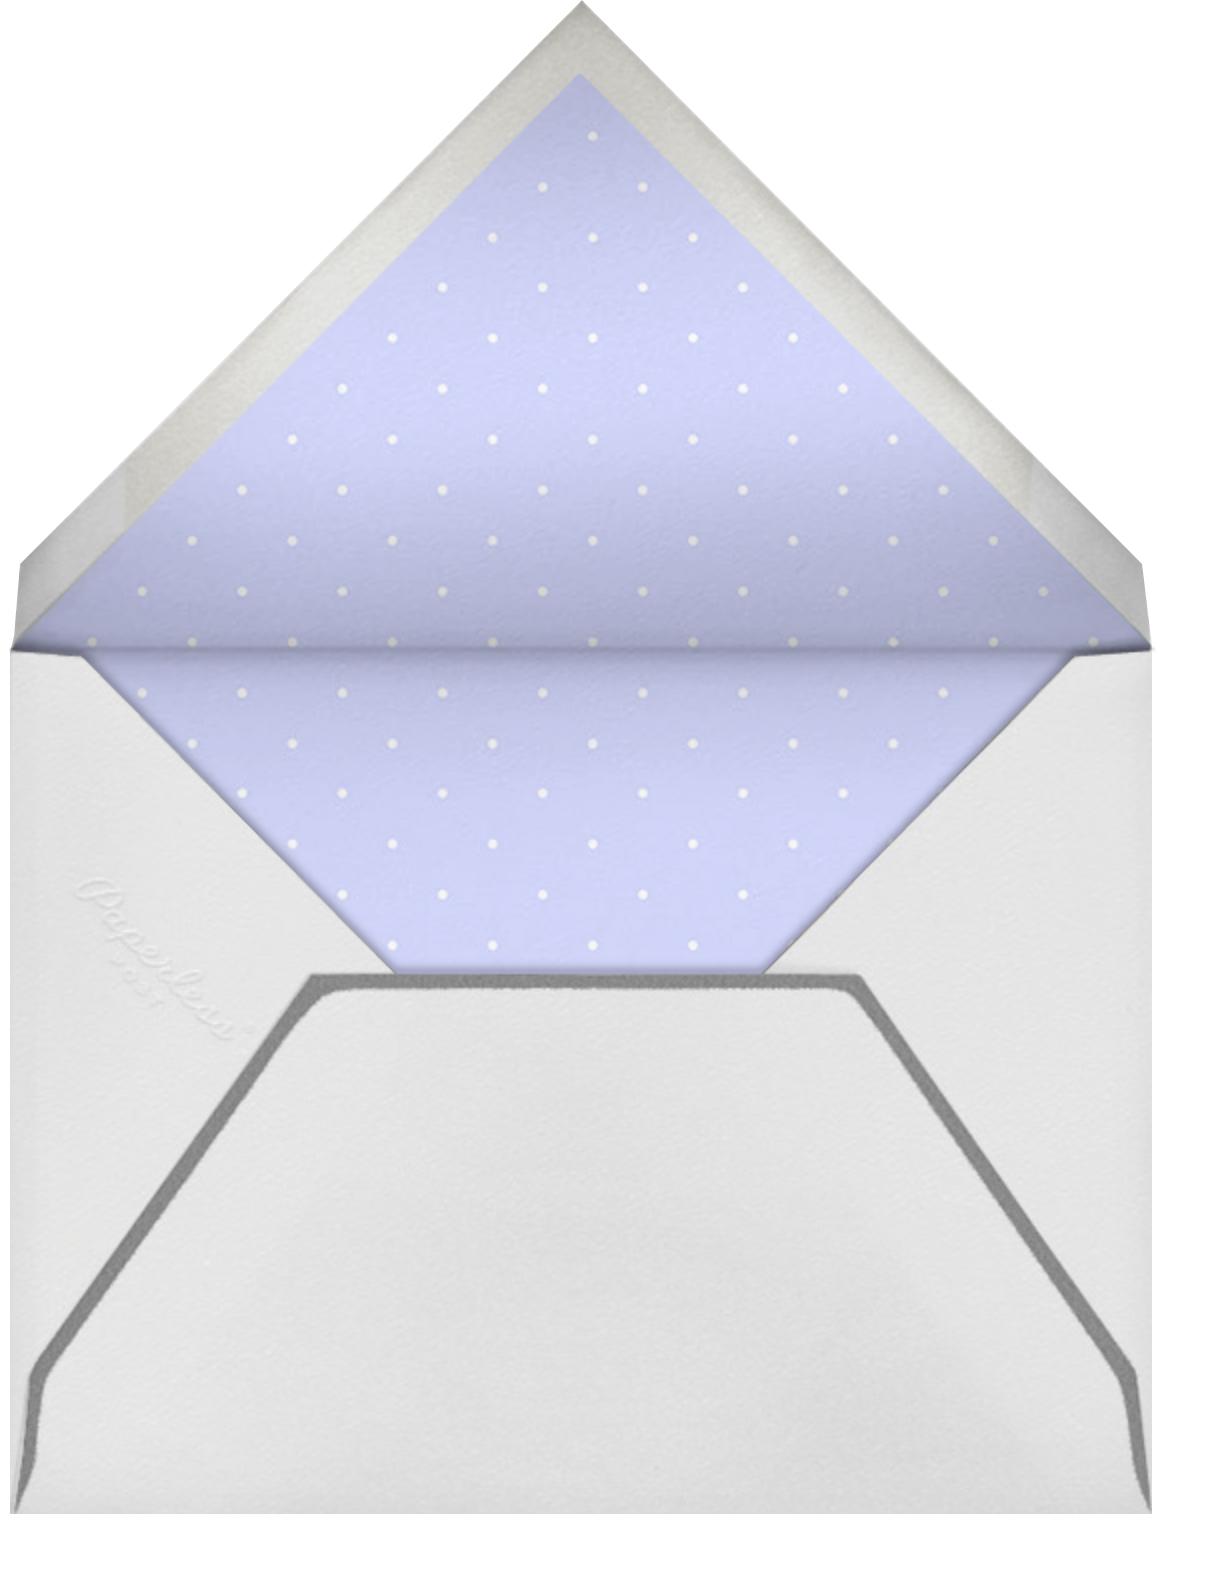 Hit the Lanes - Wisteria - Mr. Boddington's Studio - Adult birthday - envelope back